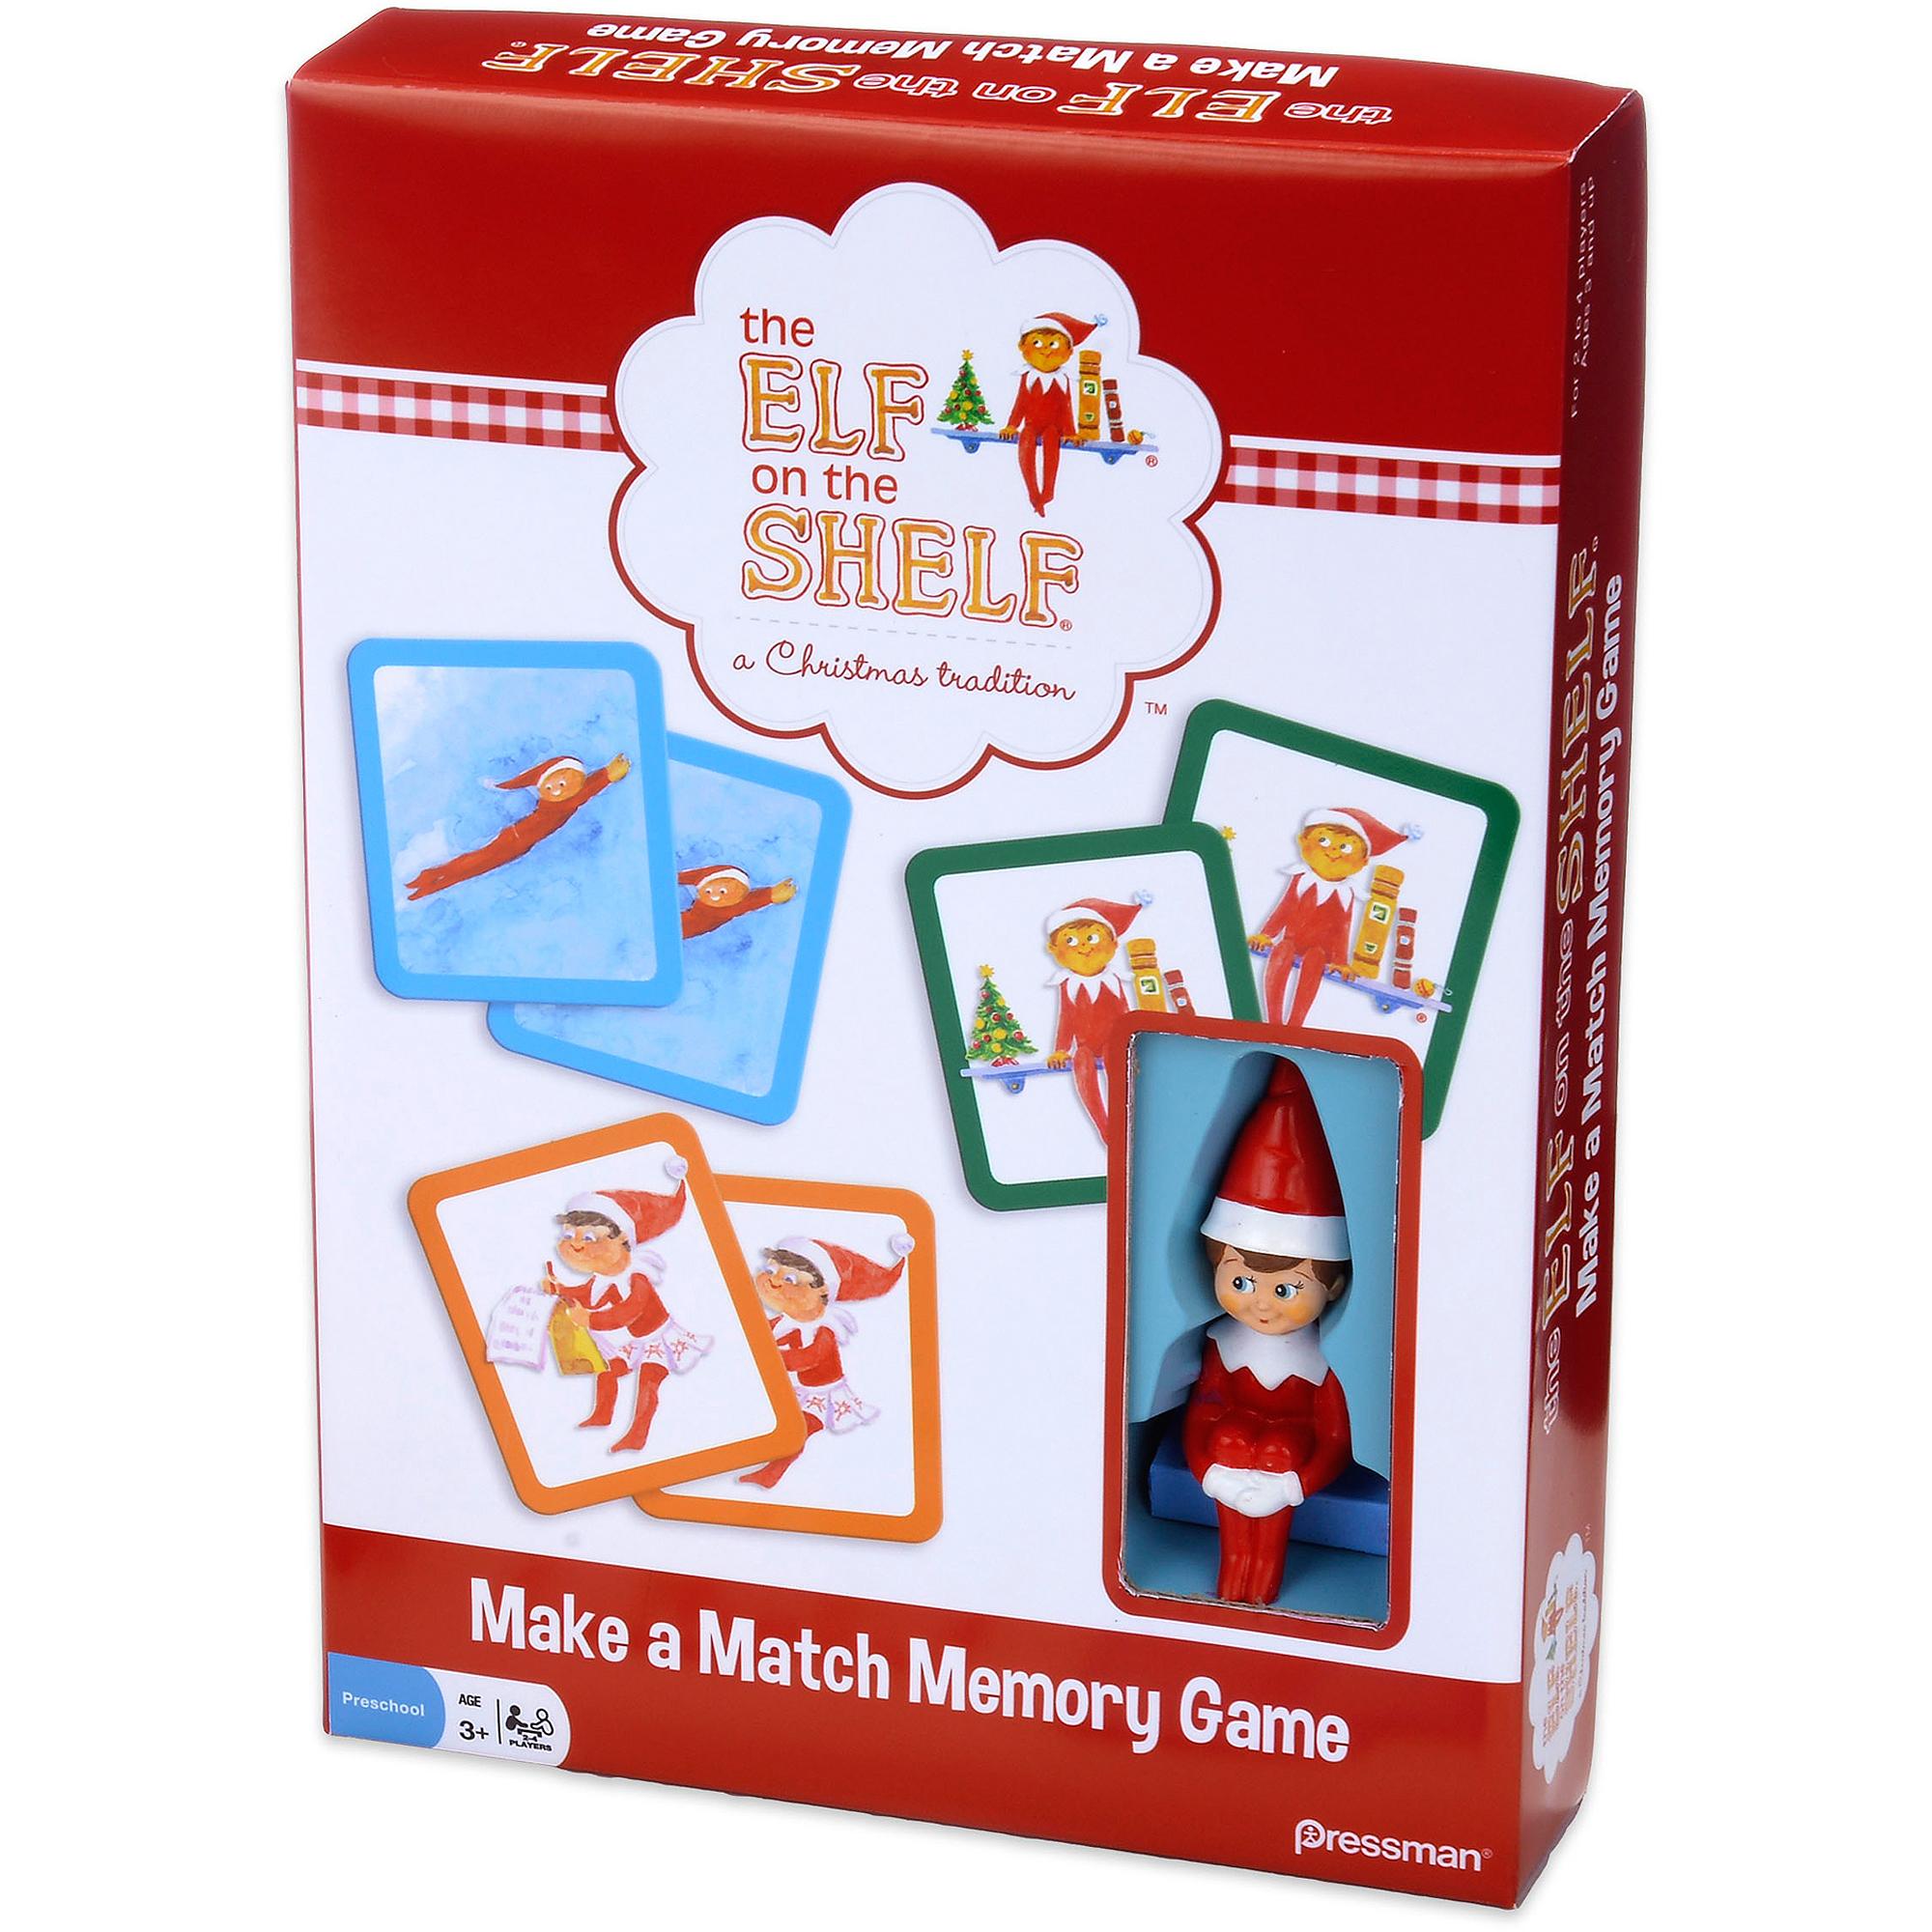 Pressman Toy Elf on the Shelf Make a Match